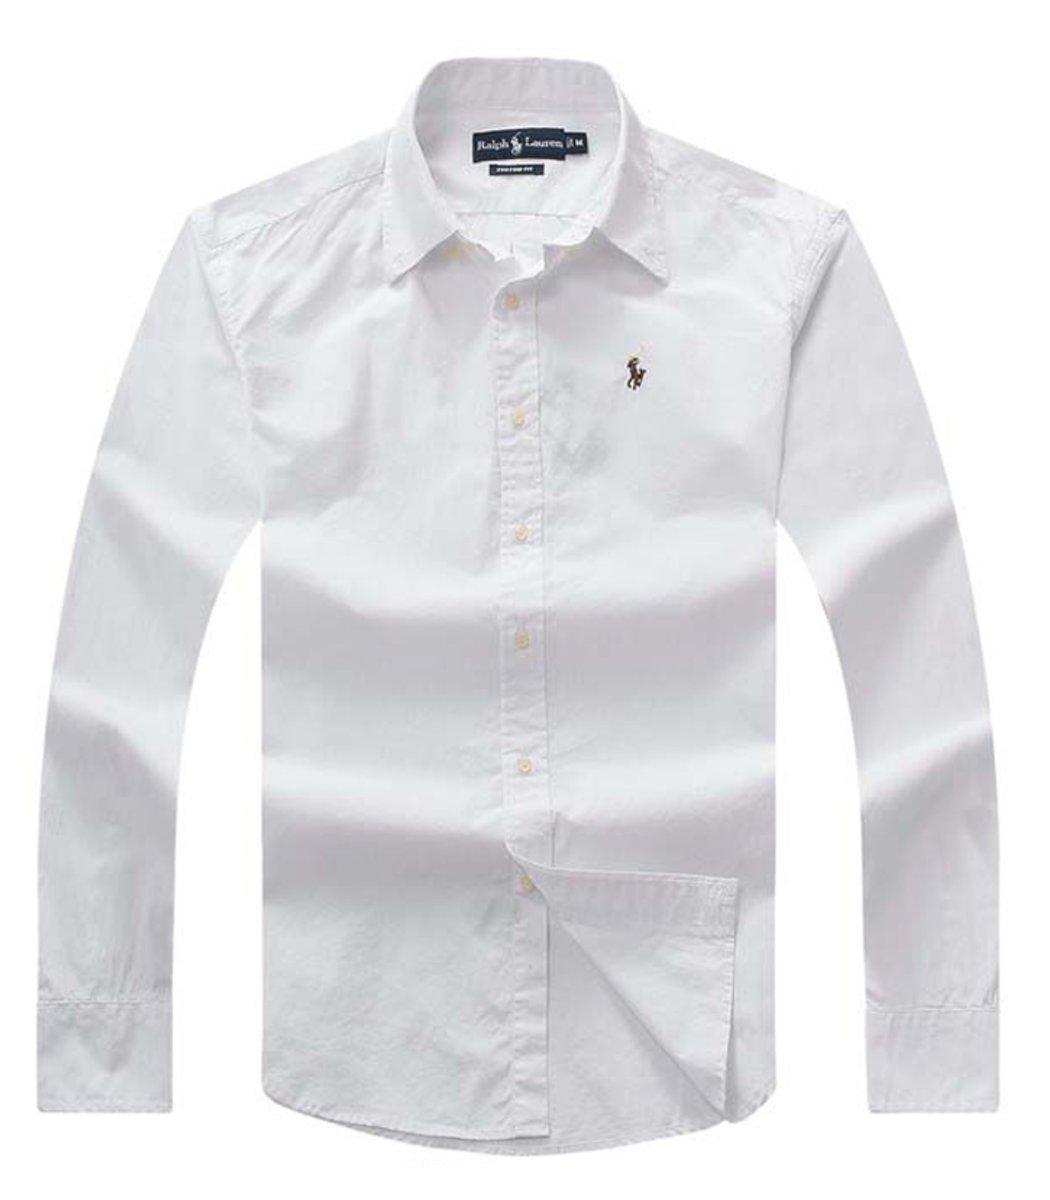 Рубашка POLO Ralph Lauren RR3 (Белый) - Белый - Вид 1